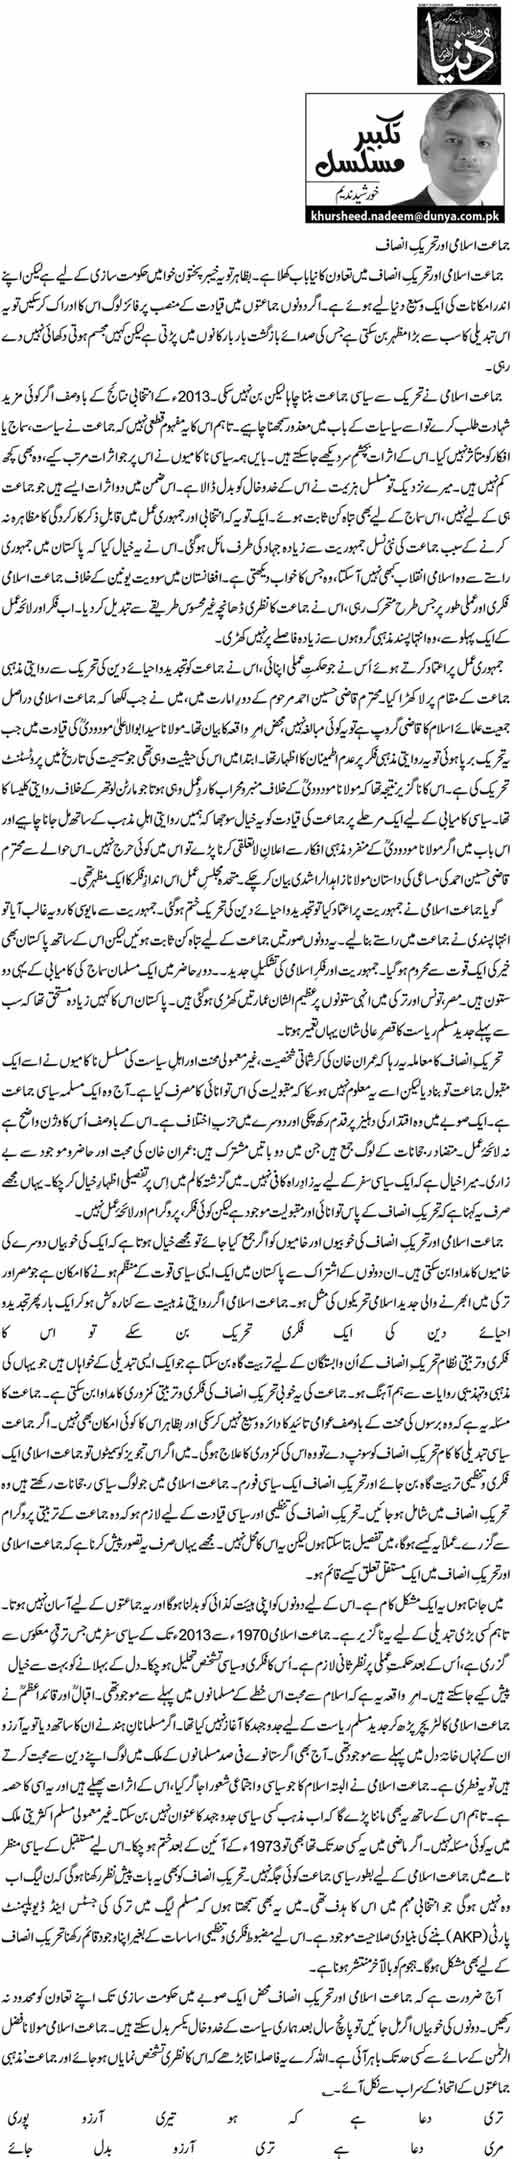 Jamat e Islami Aur Tehreek e Insaaf - Khursheed Nadeem